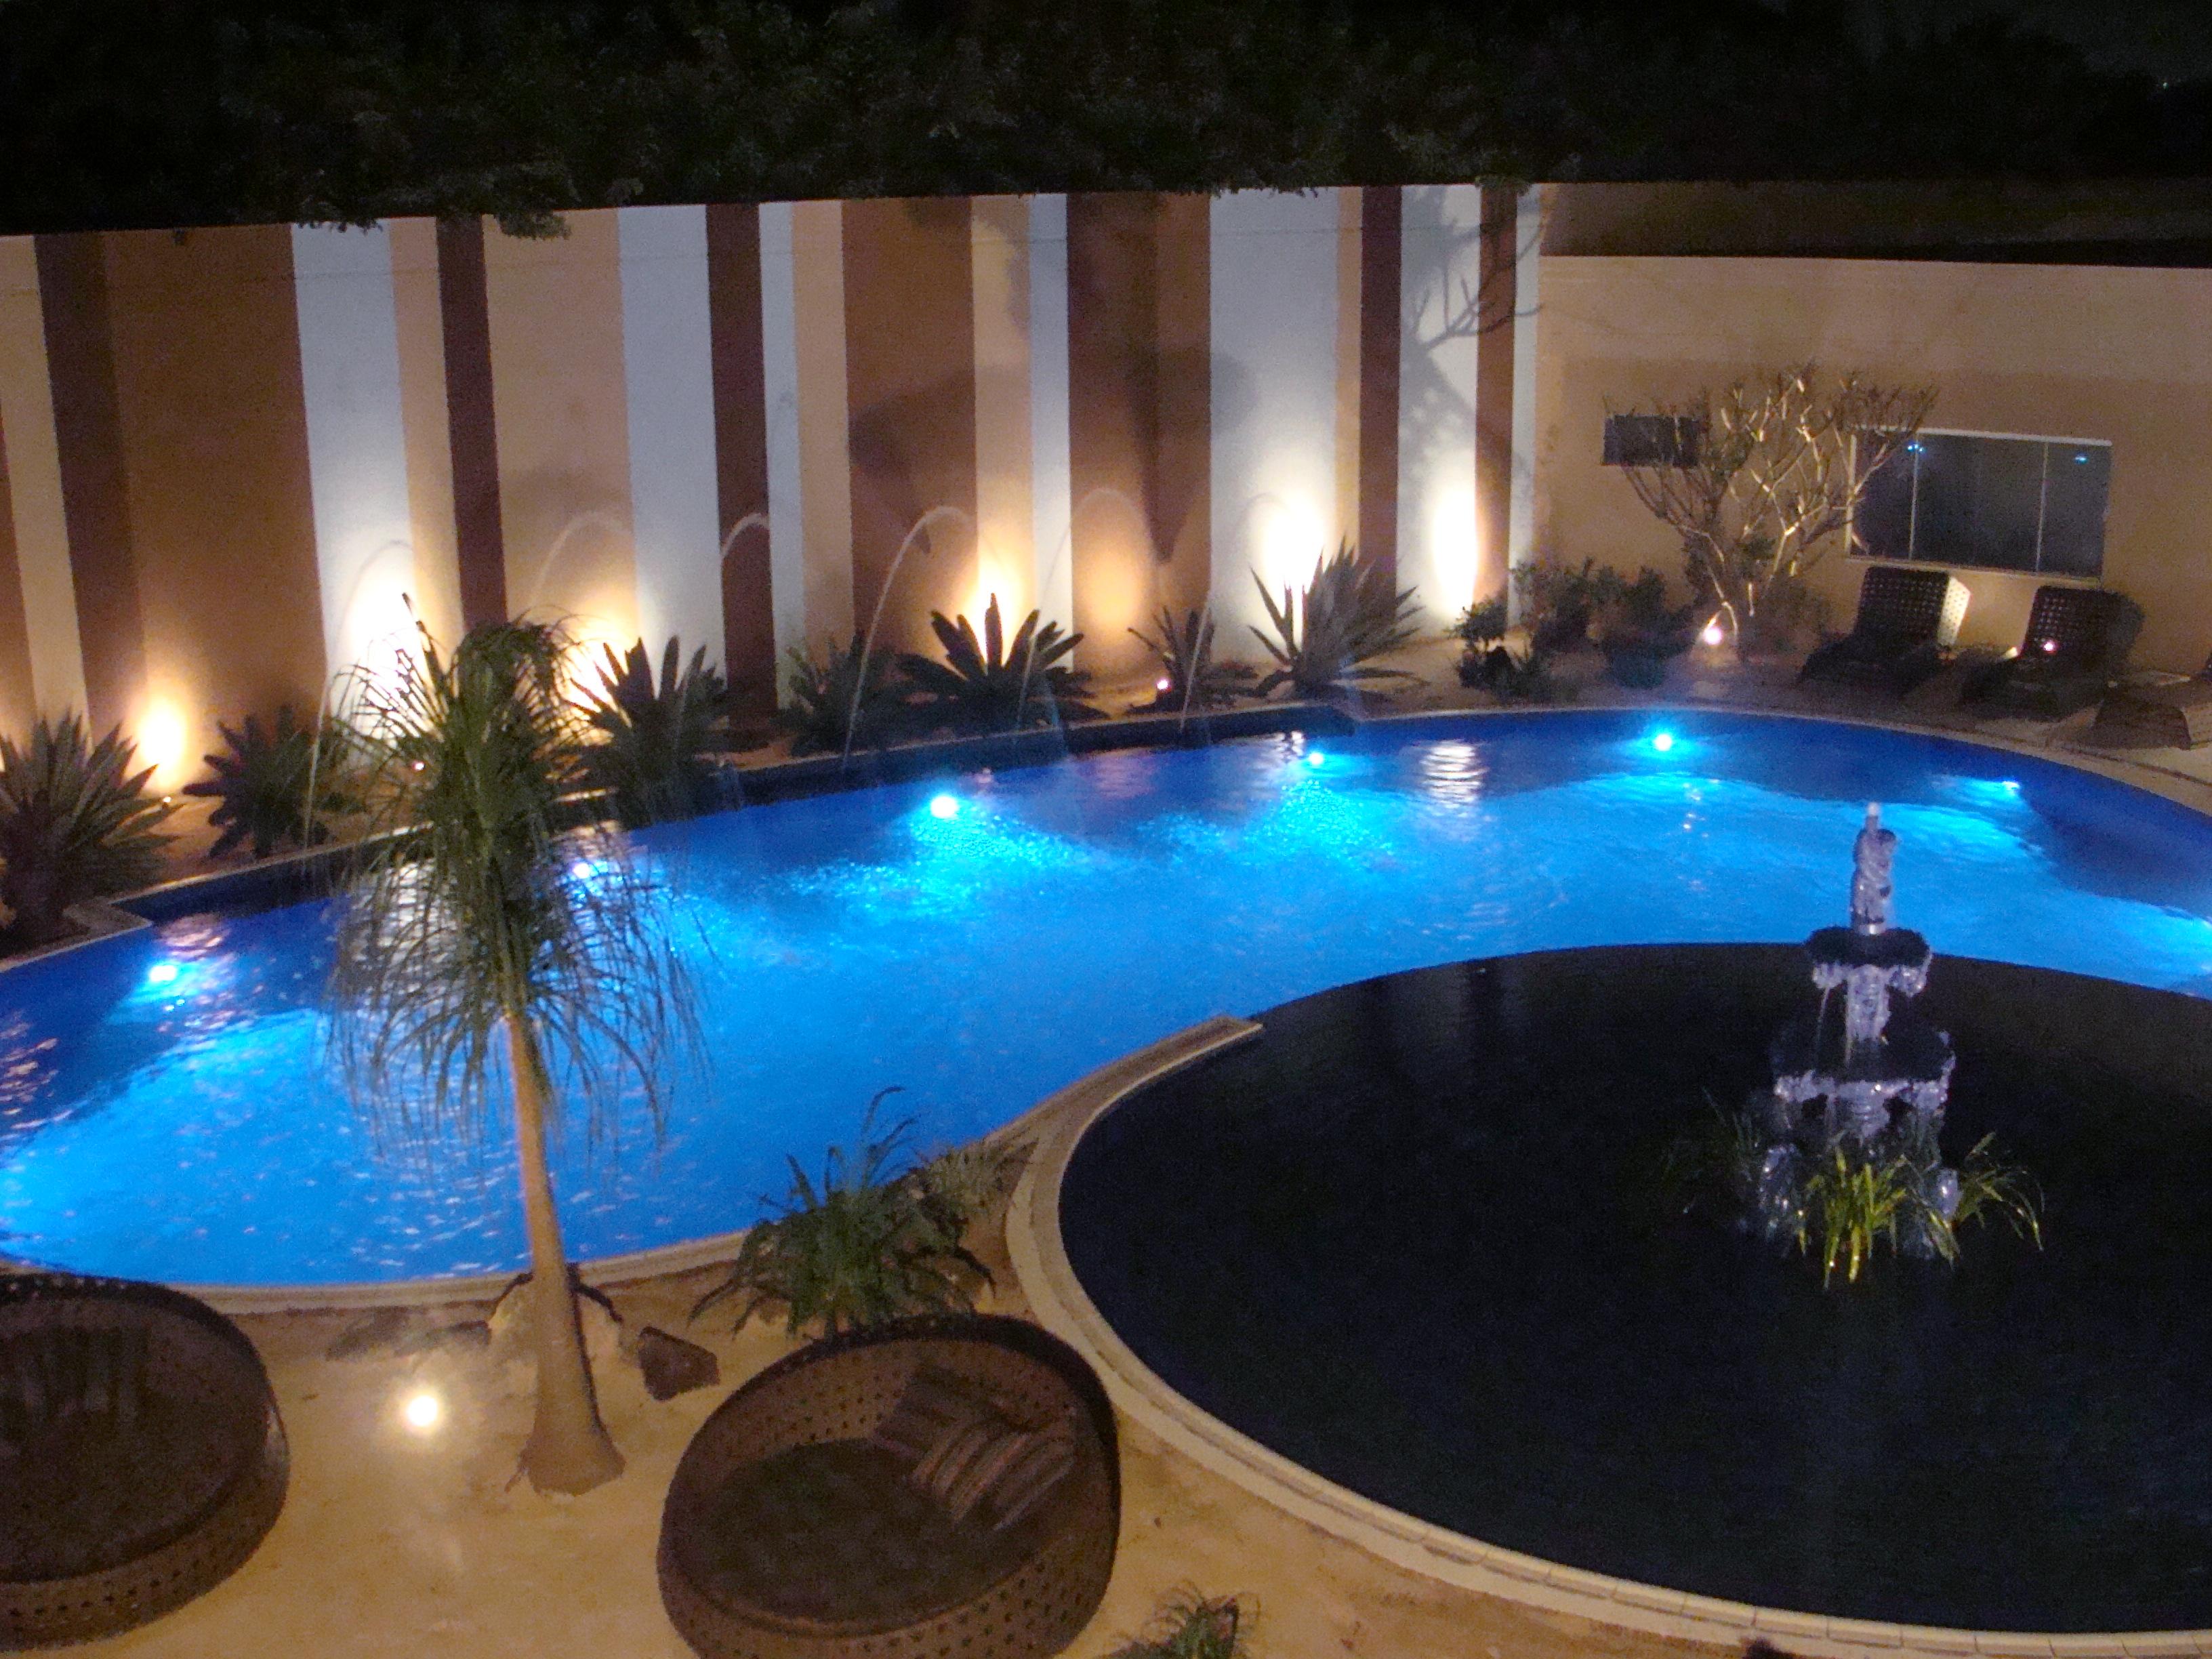 Ilumina o led cromoterapia piscina - Leds para piscinas ...